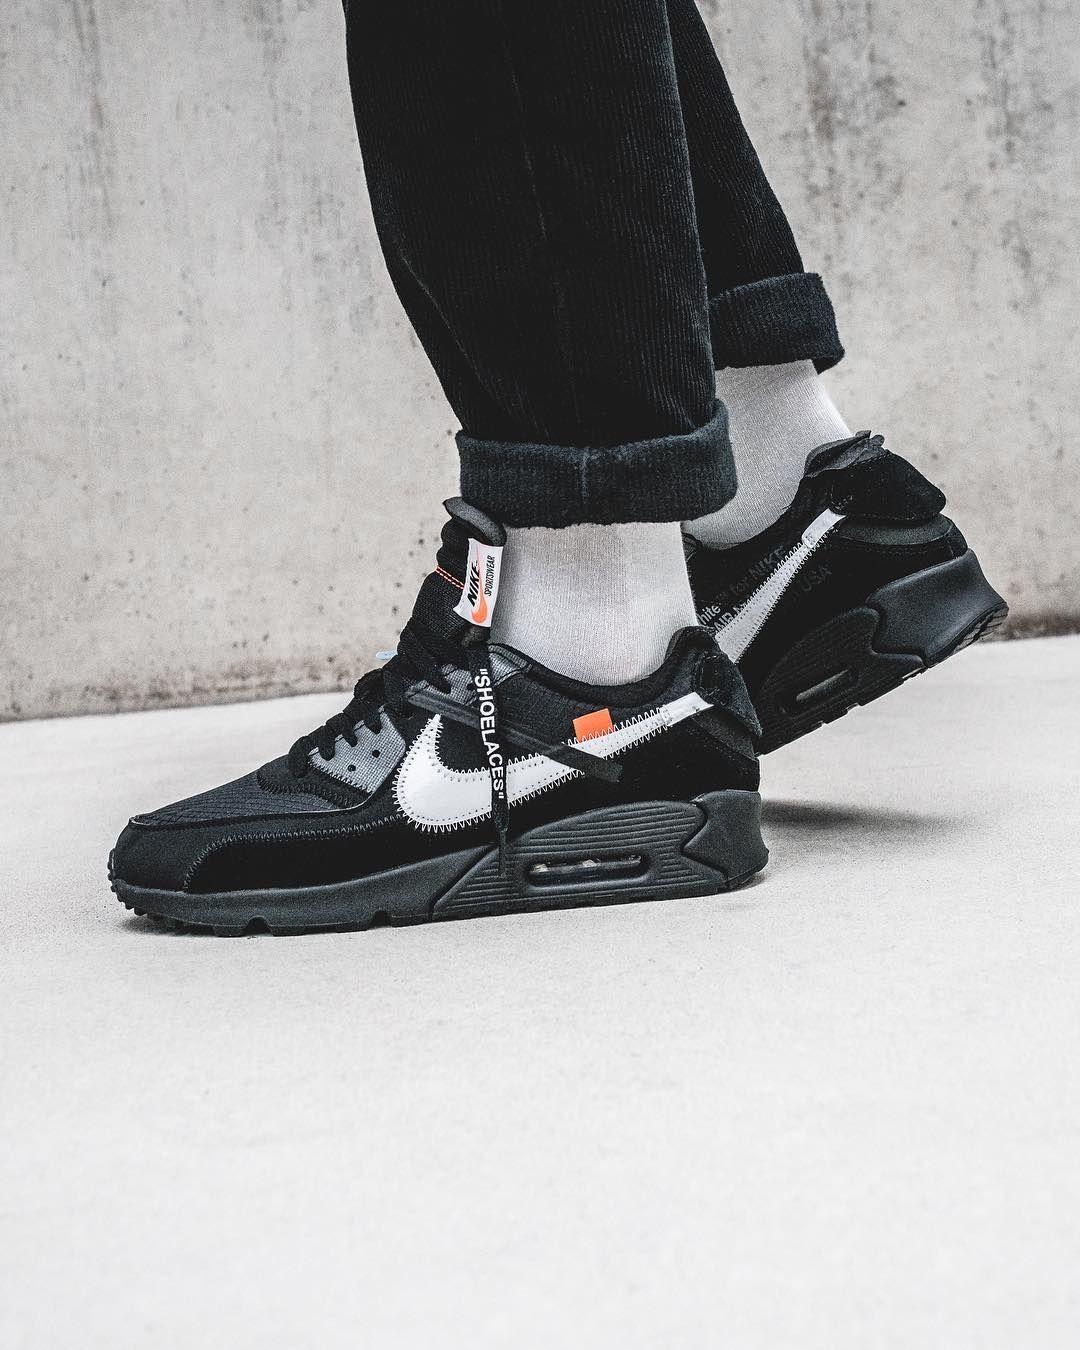 Sneaker Game: Nike Air Max 90 – Black Pine x Light Bone x